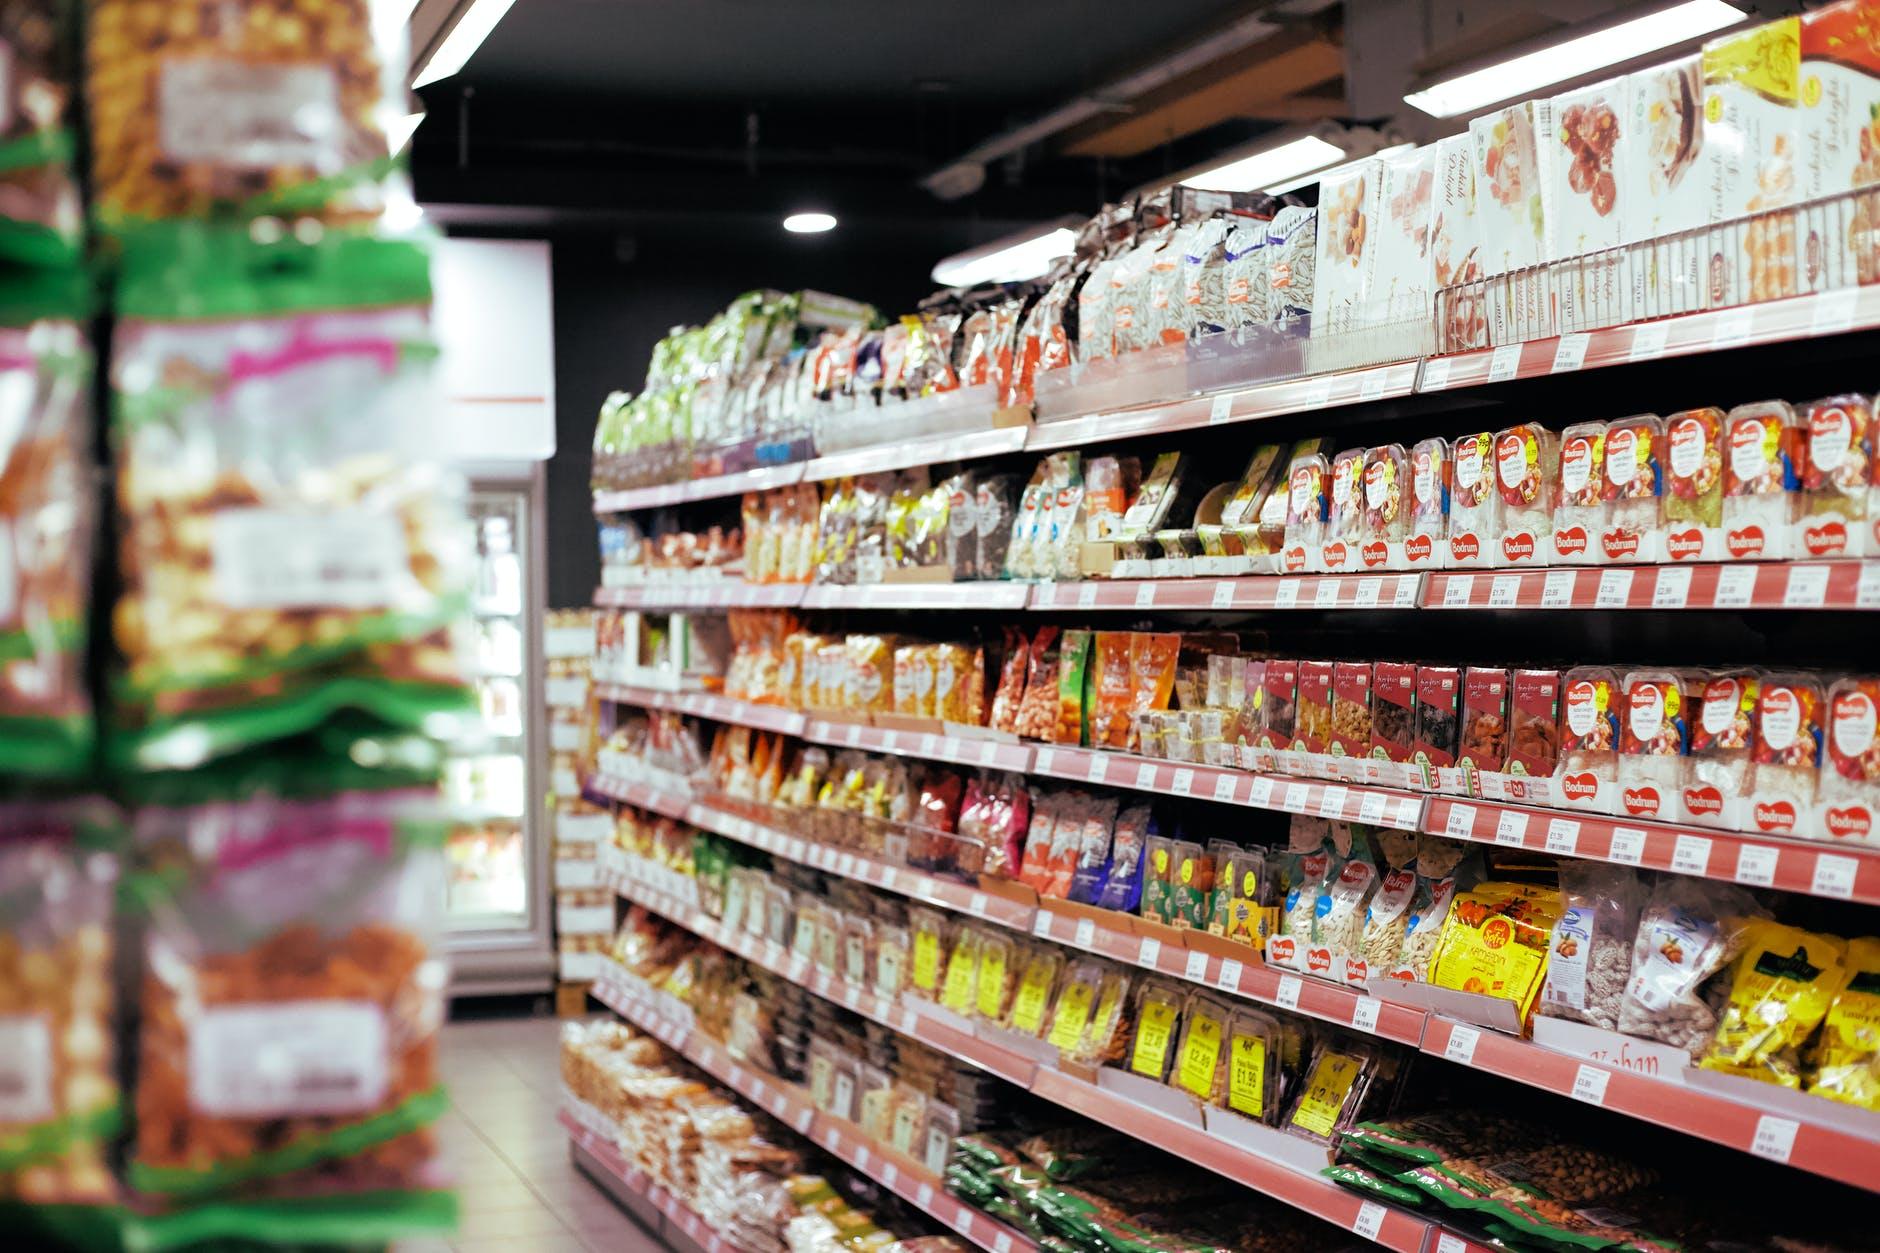 items organized on shelves